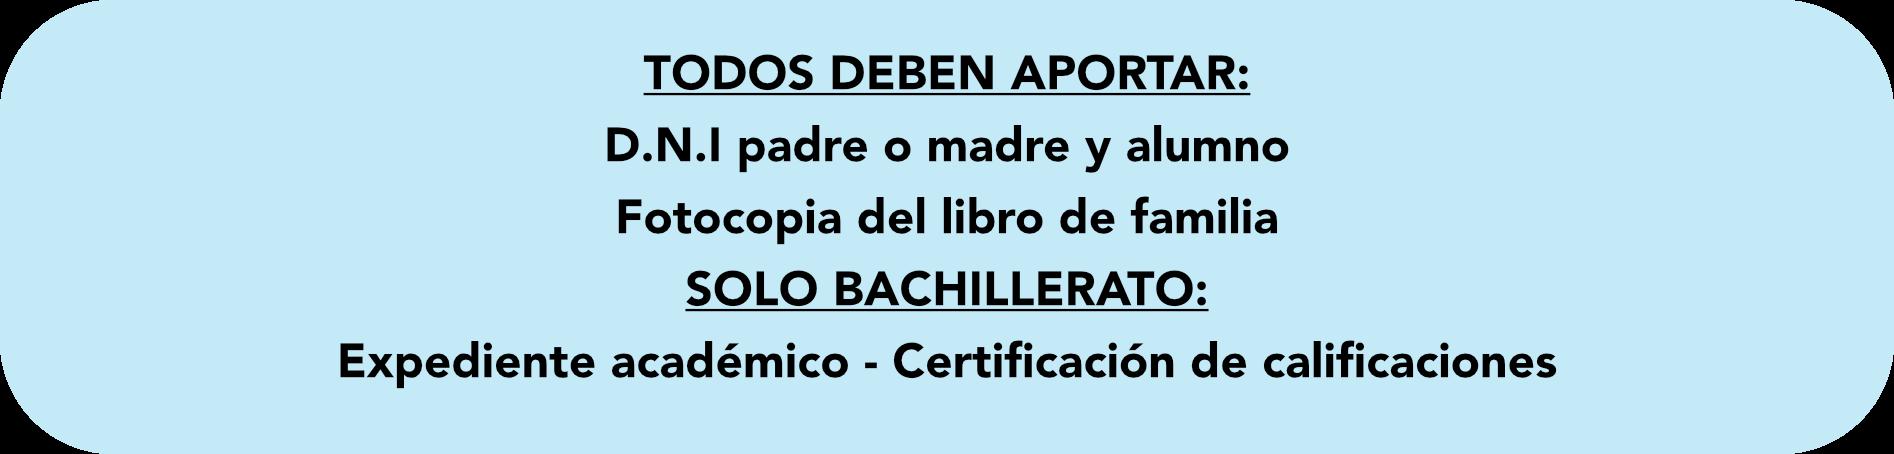 documentacion.png